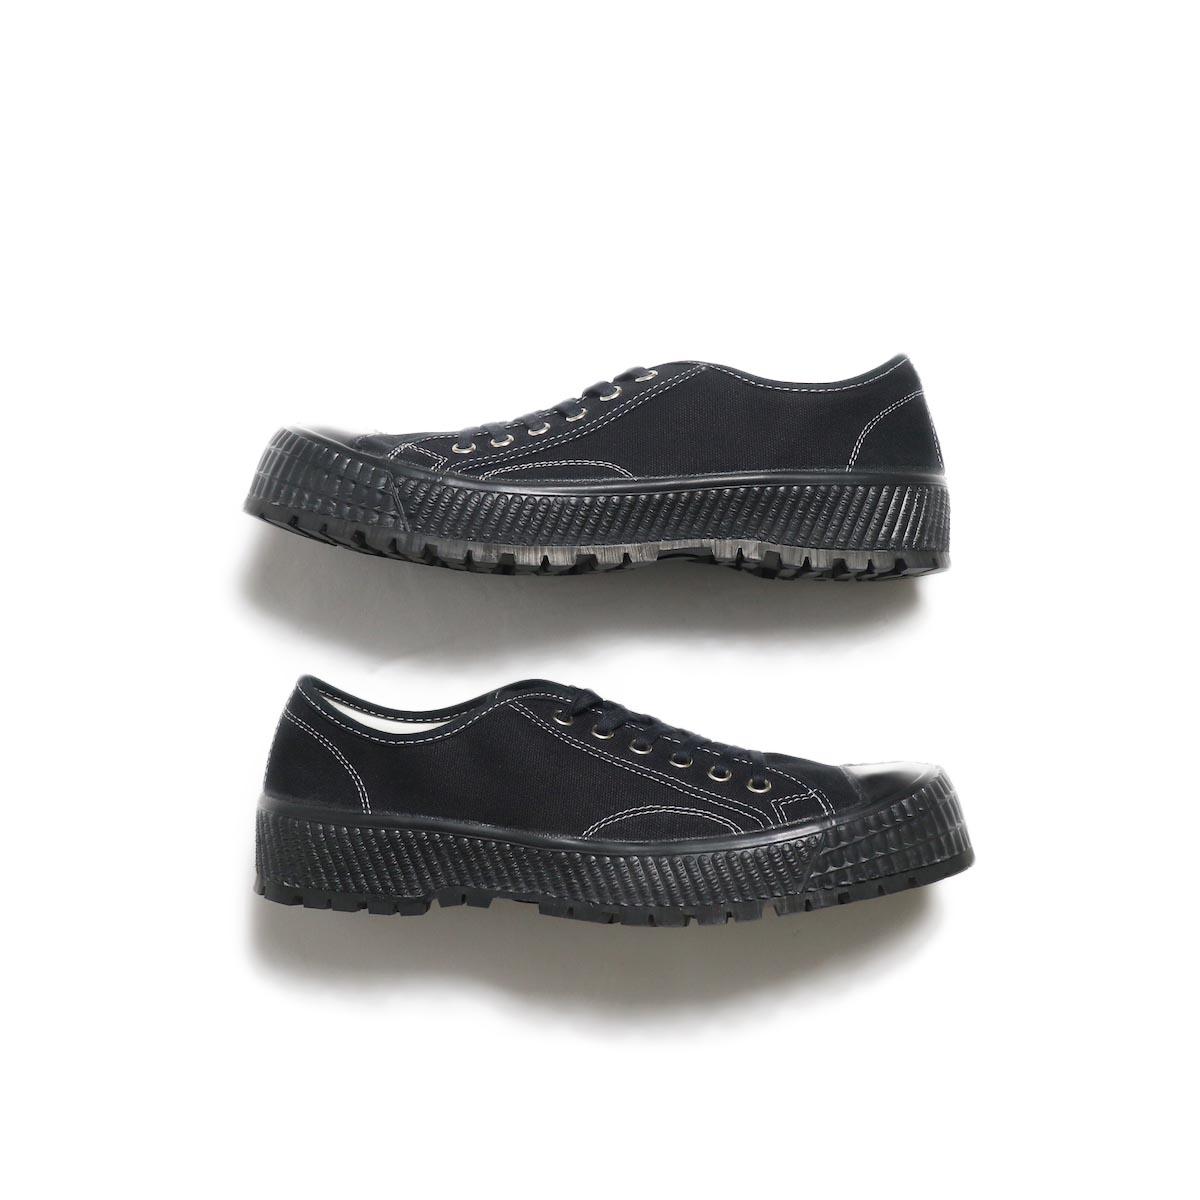 ZDA / 2100-F Climber Sole Cnavas Sneaker (Black)サイド